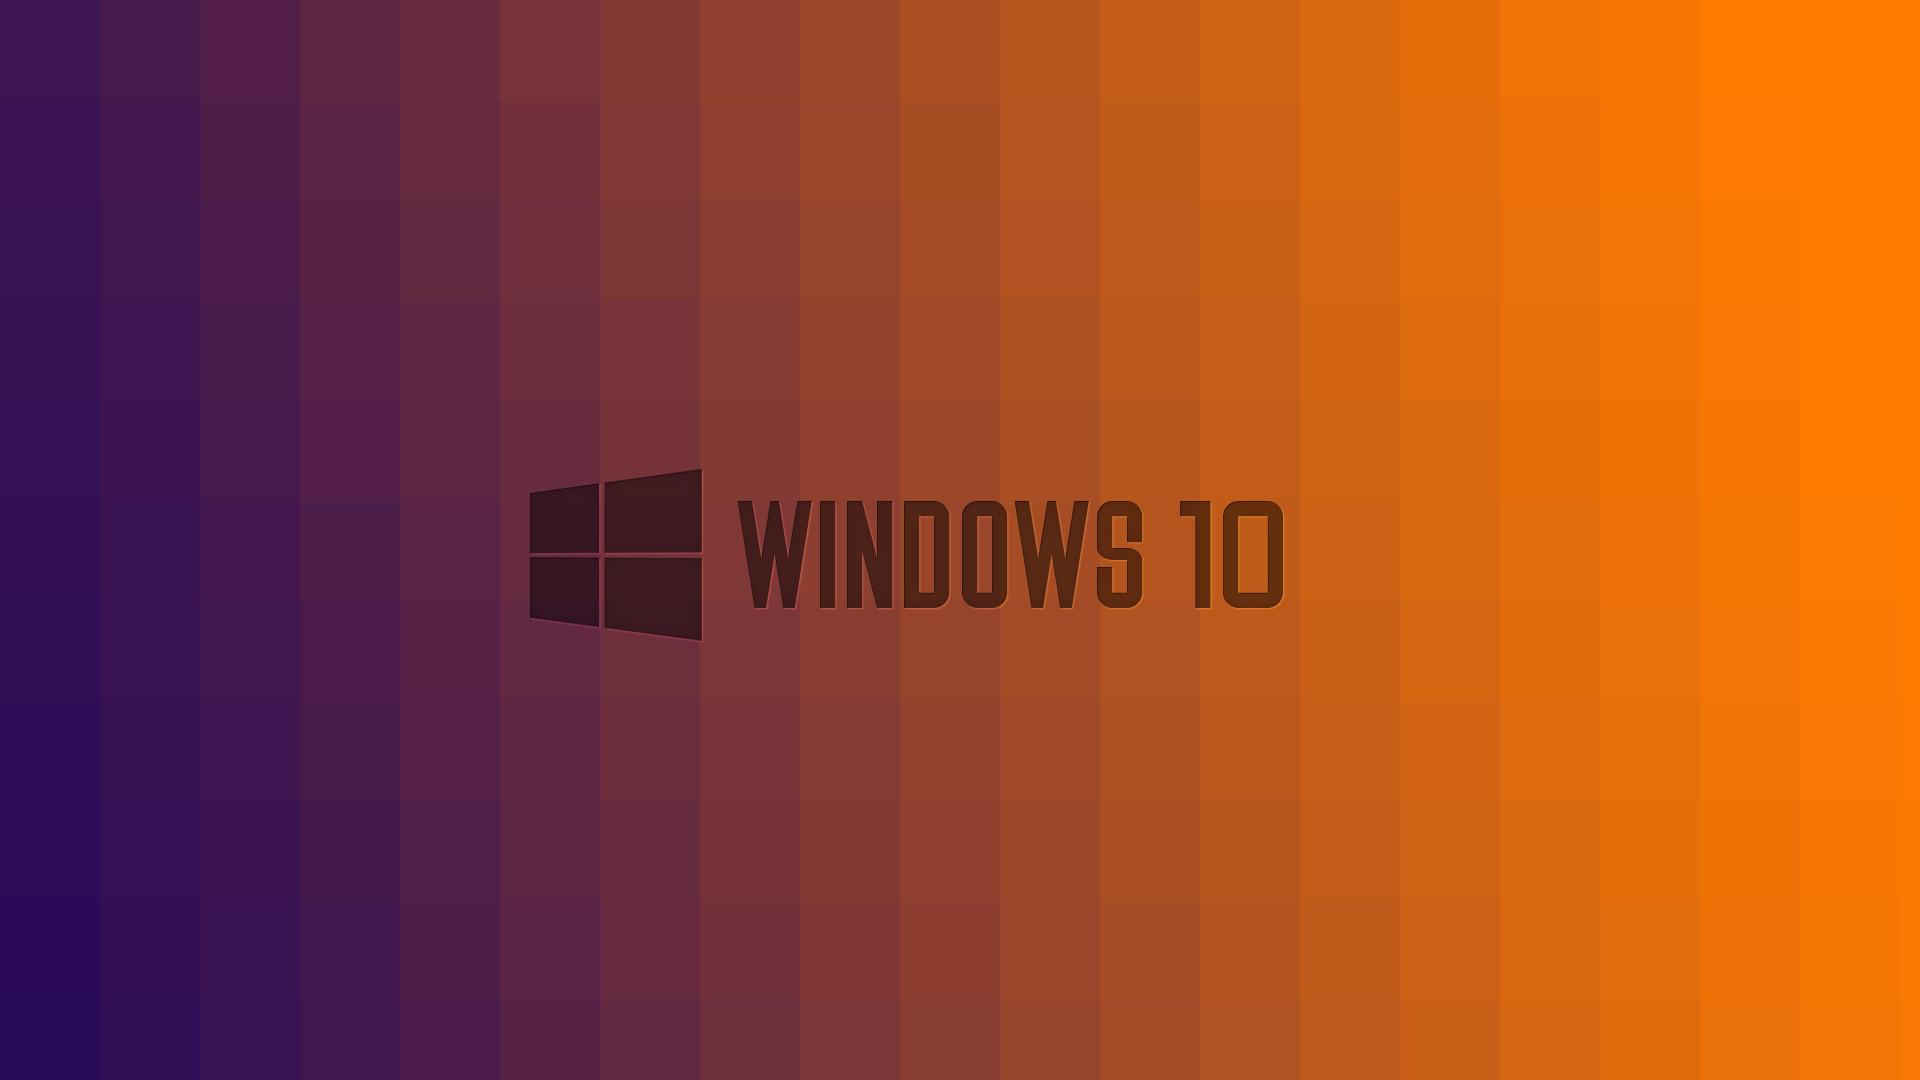 Windows 10 Wallpaper 1080p Full HD Purple To Orange Fade